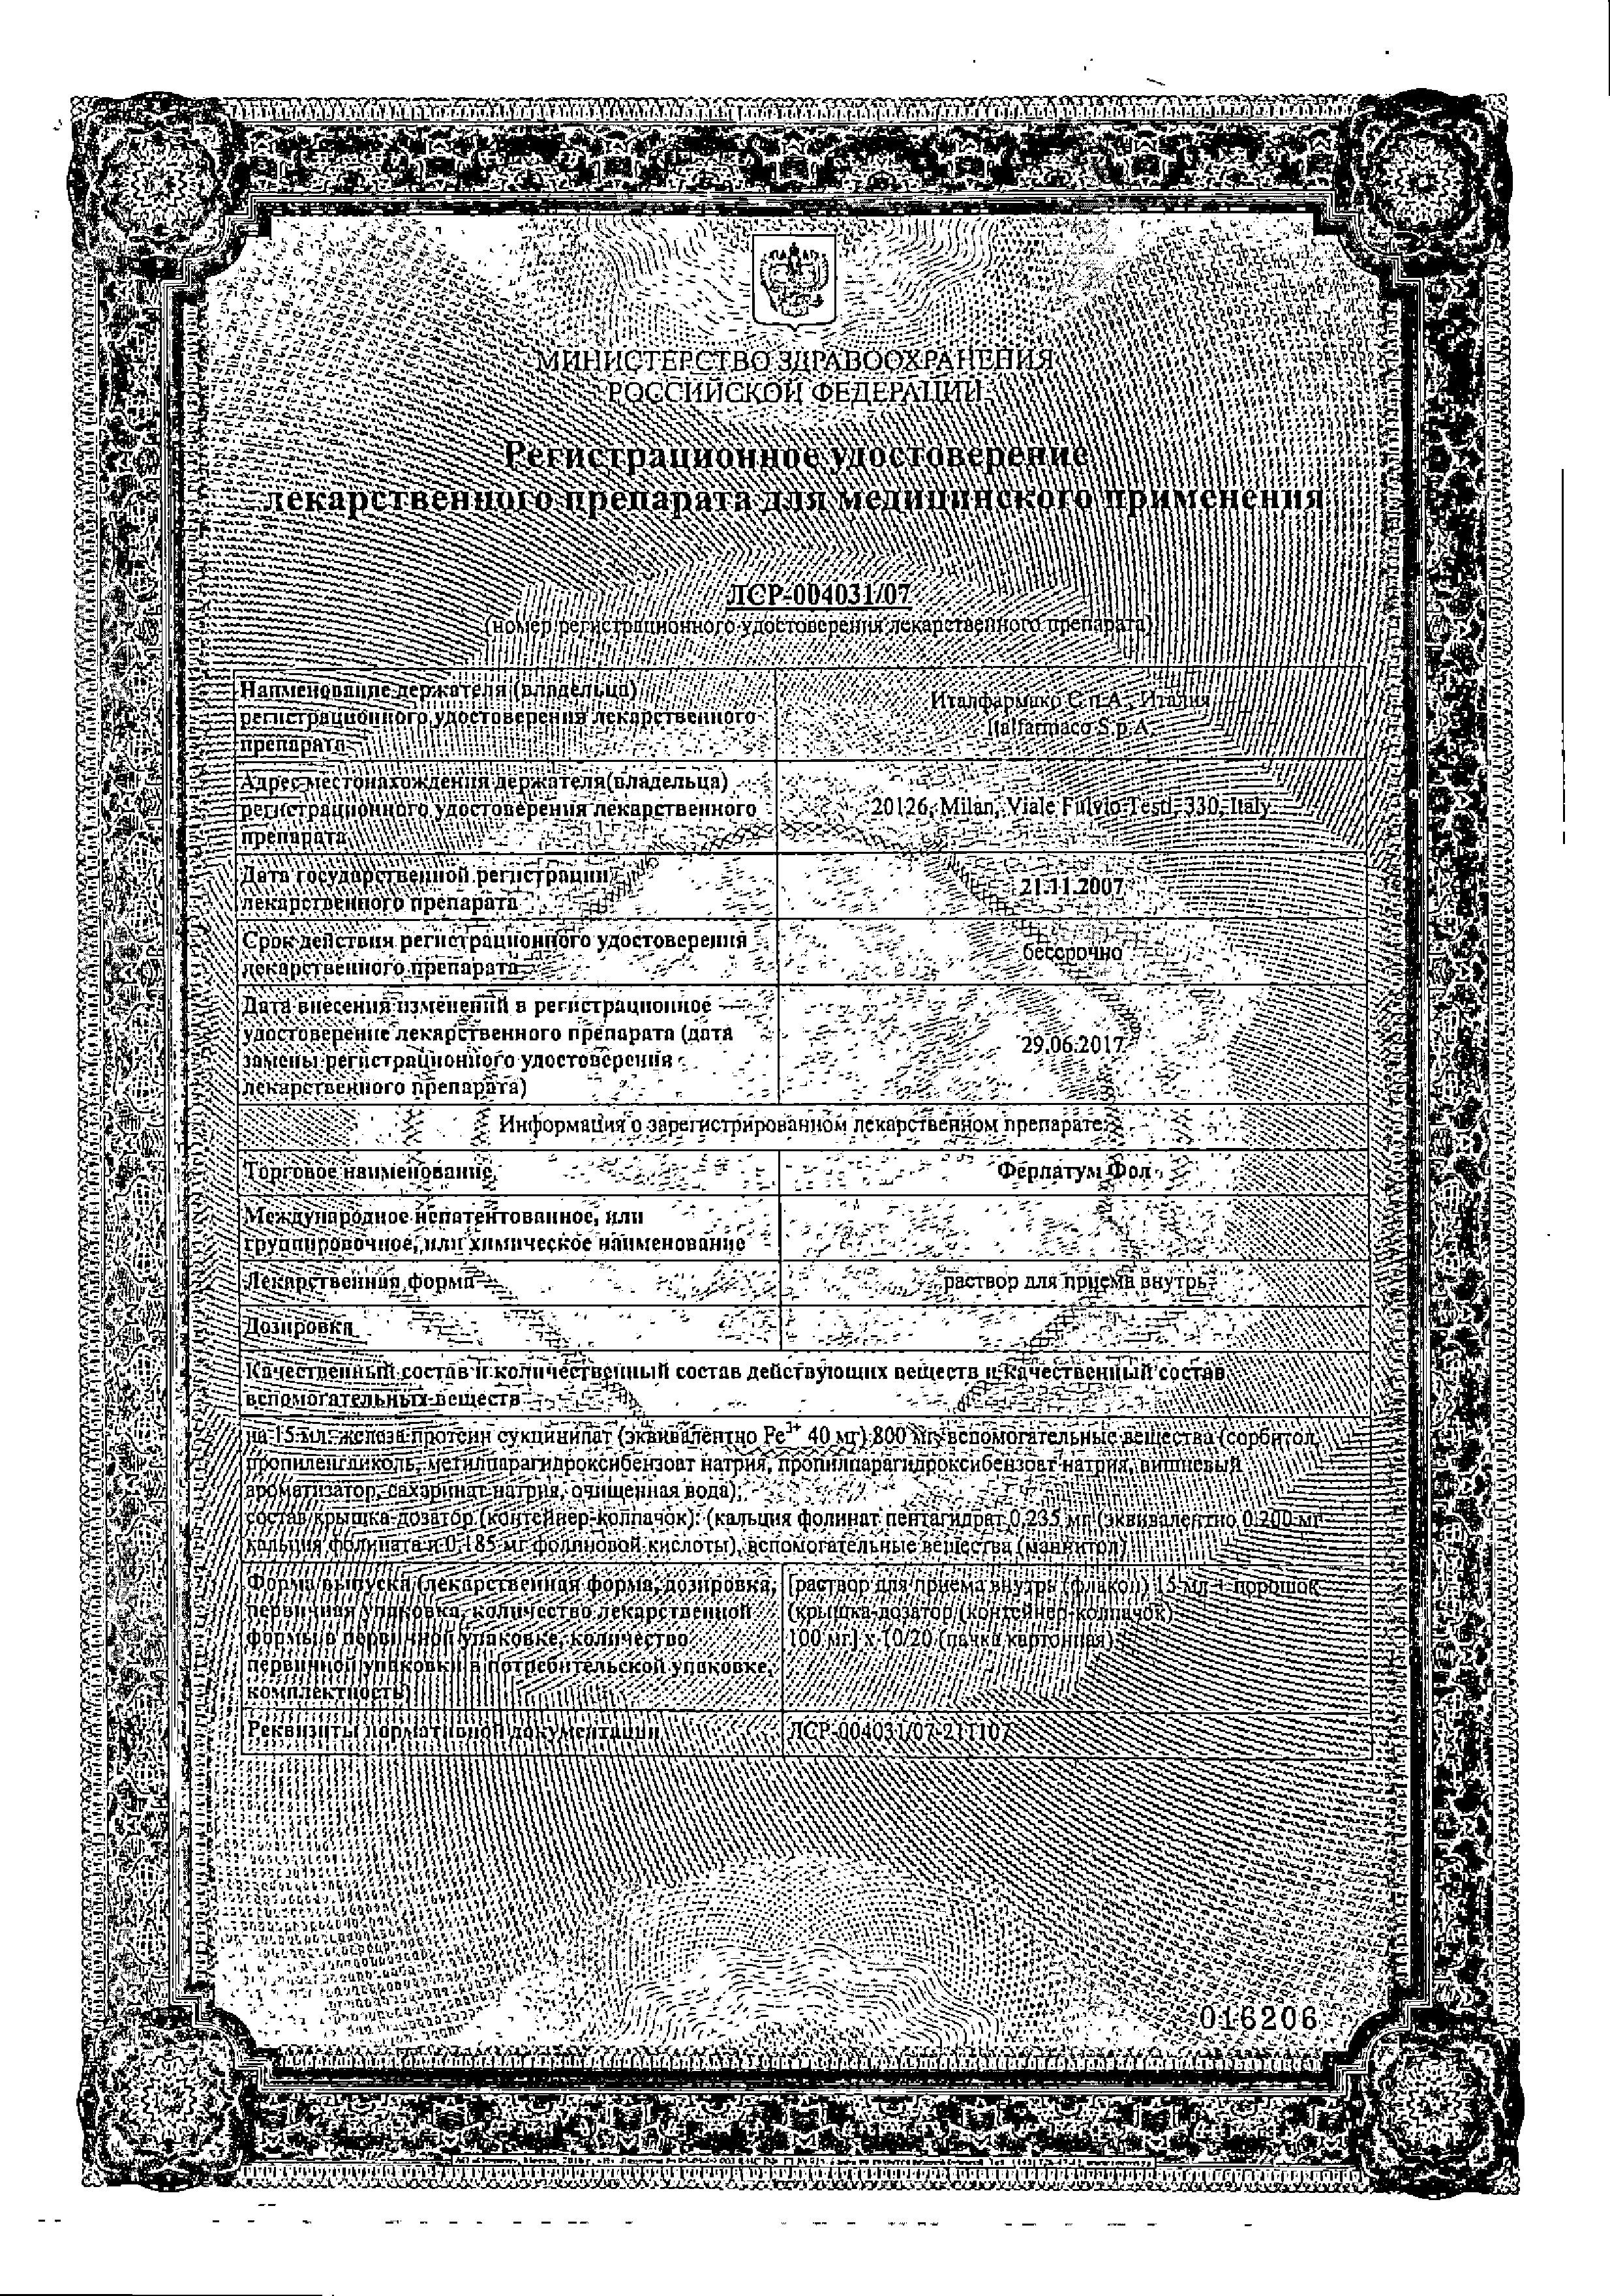 Ферлатум Фол сертификат